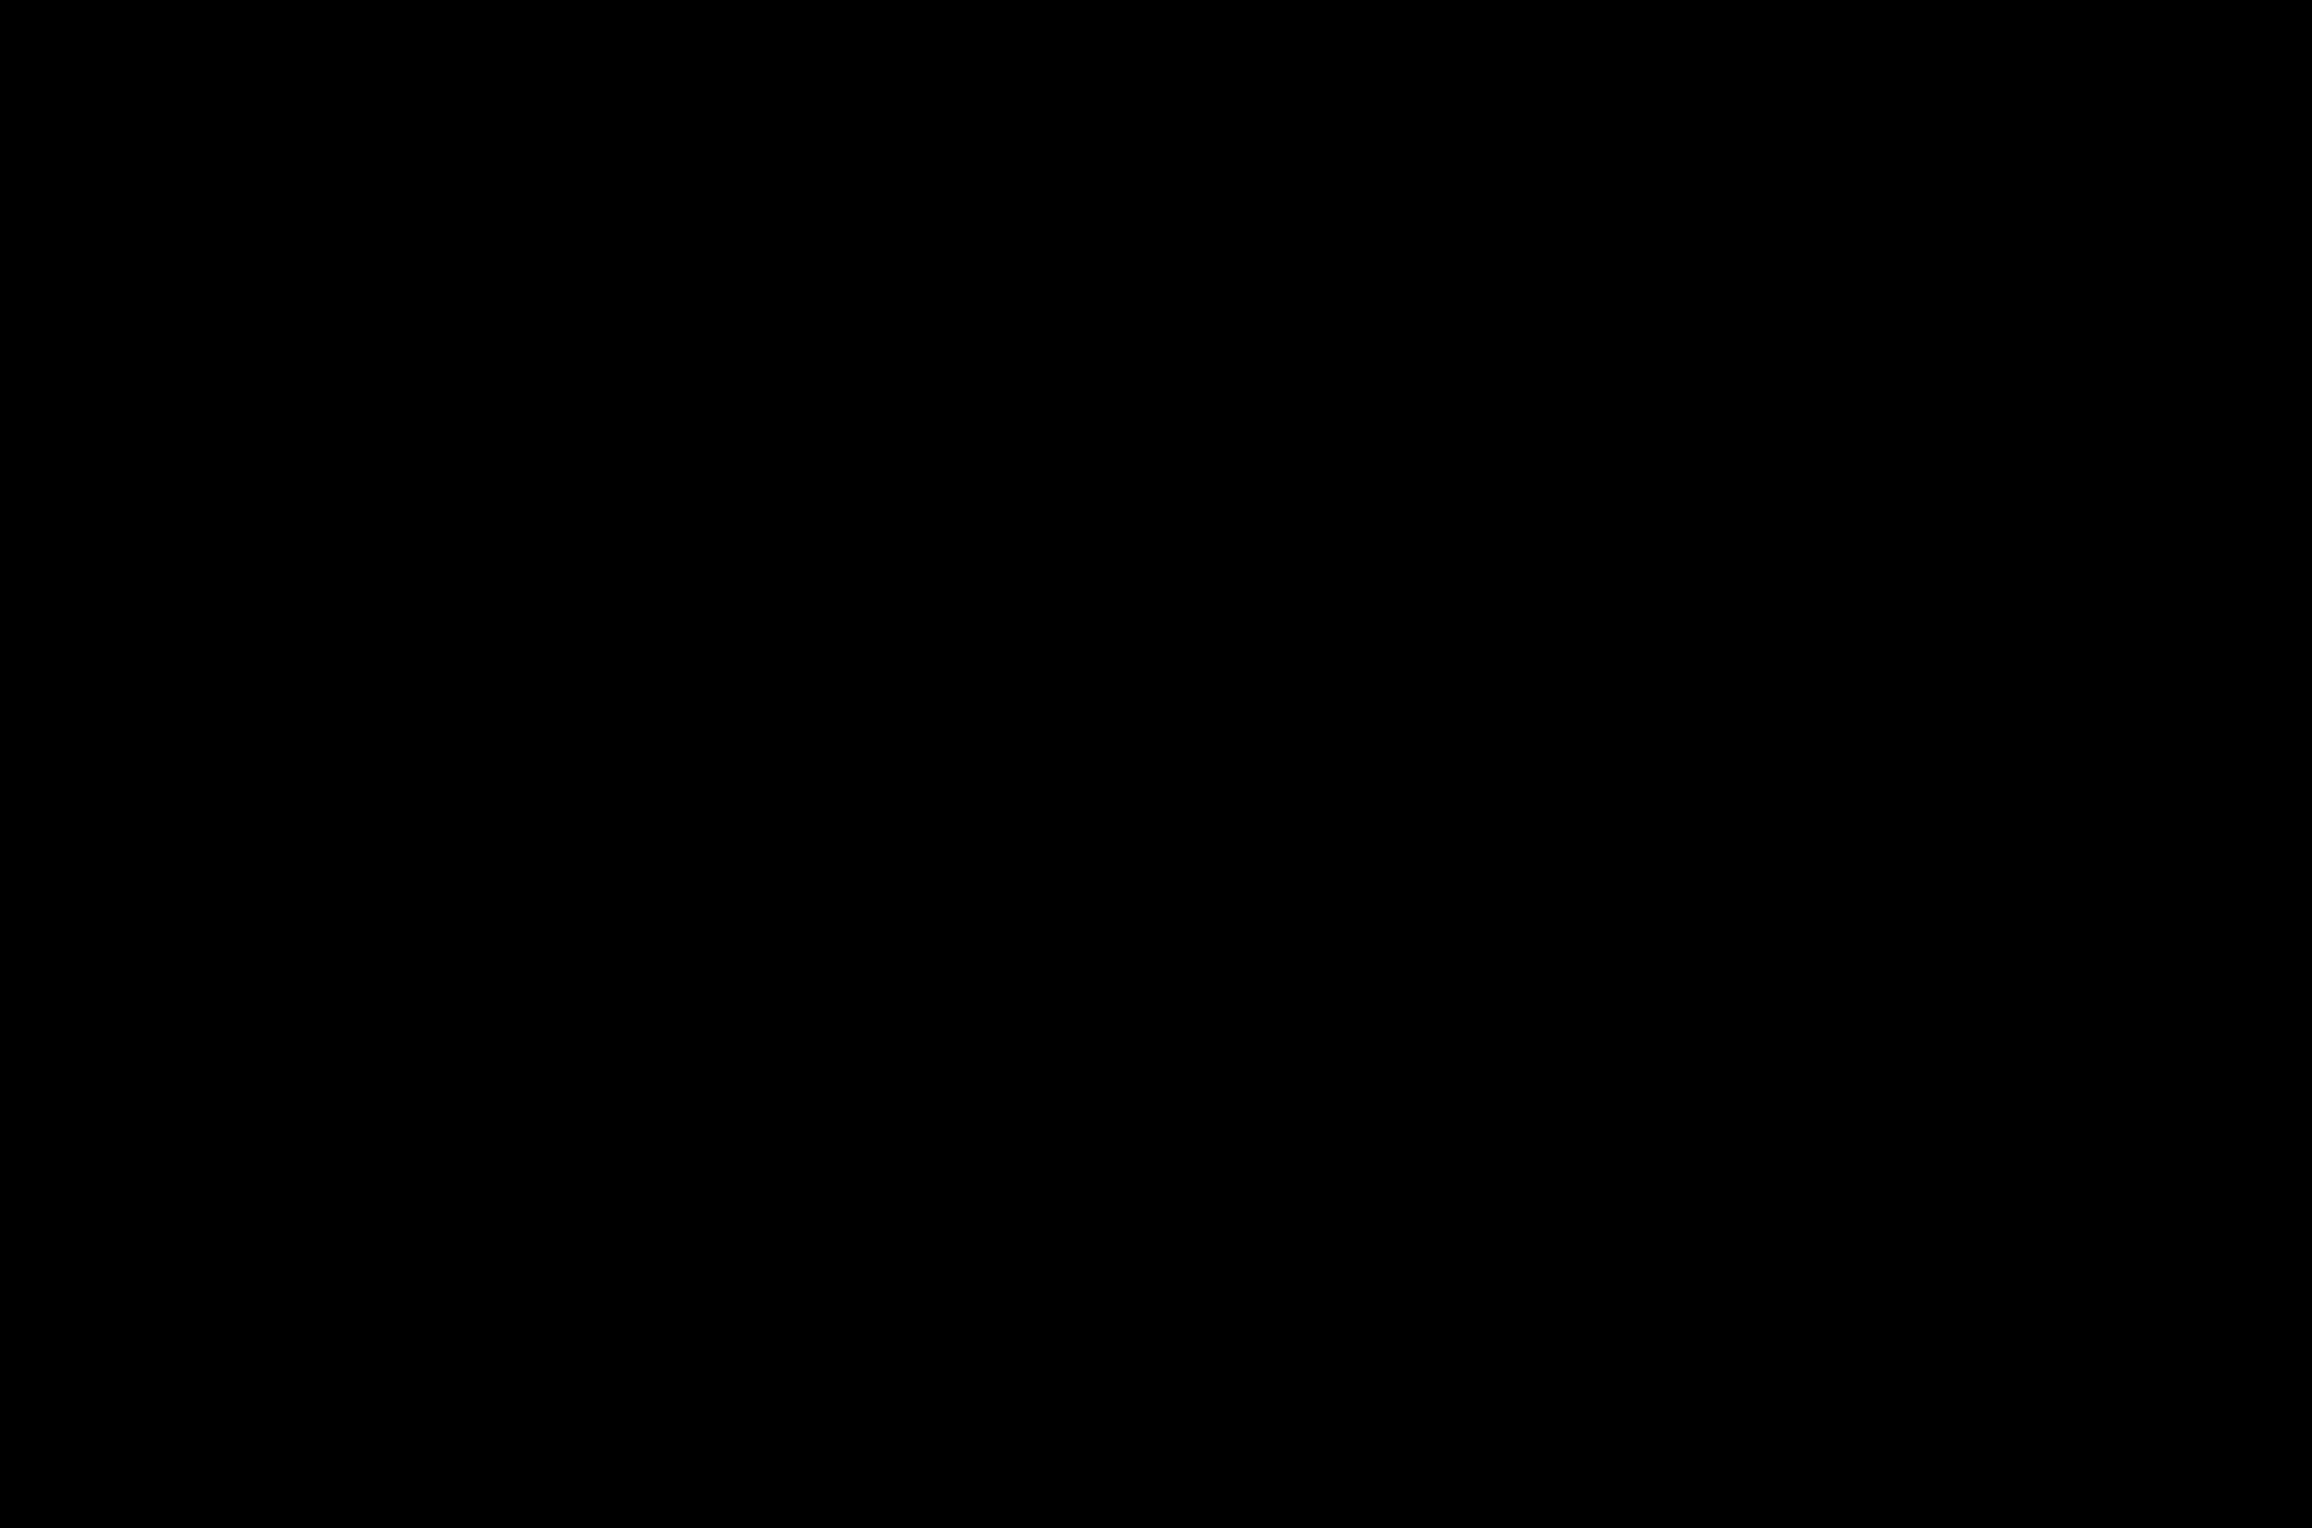 Peace clipart sighn BIG Sign Clipart IMAGE (PNG)